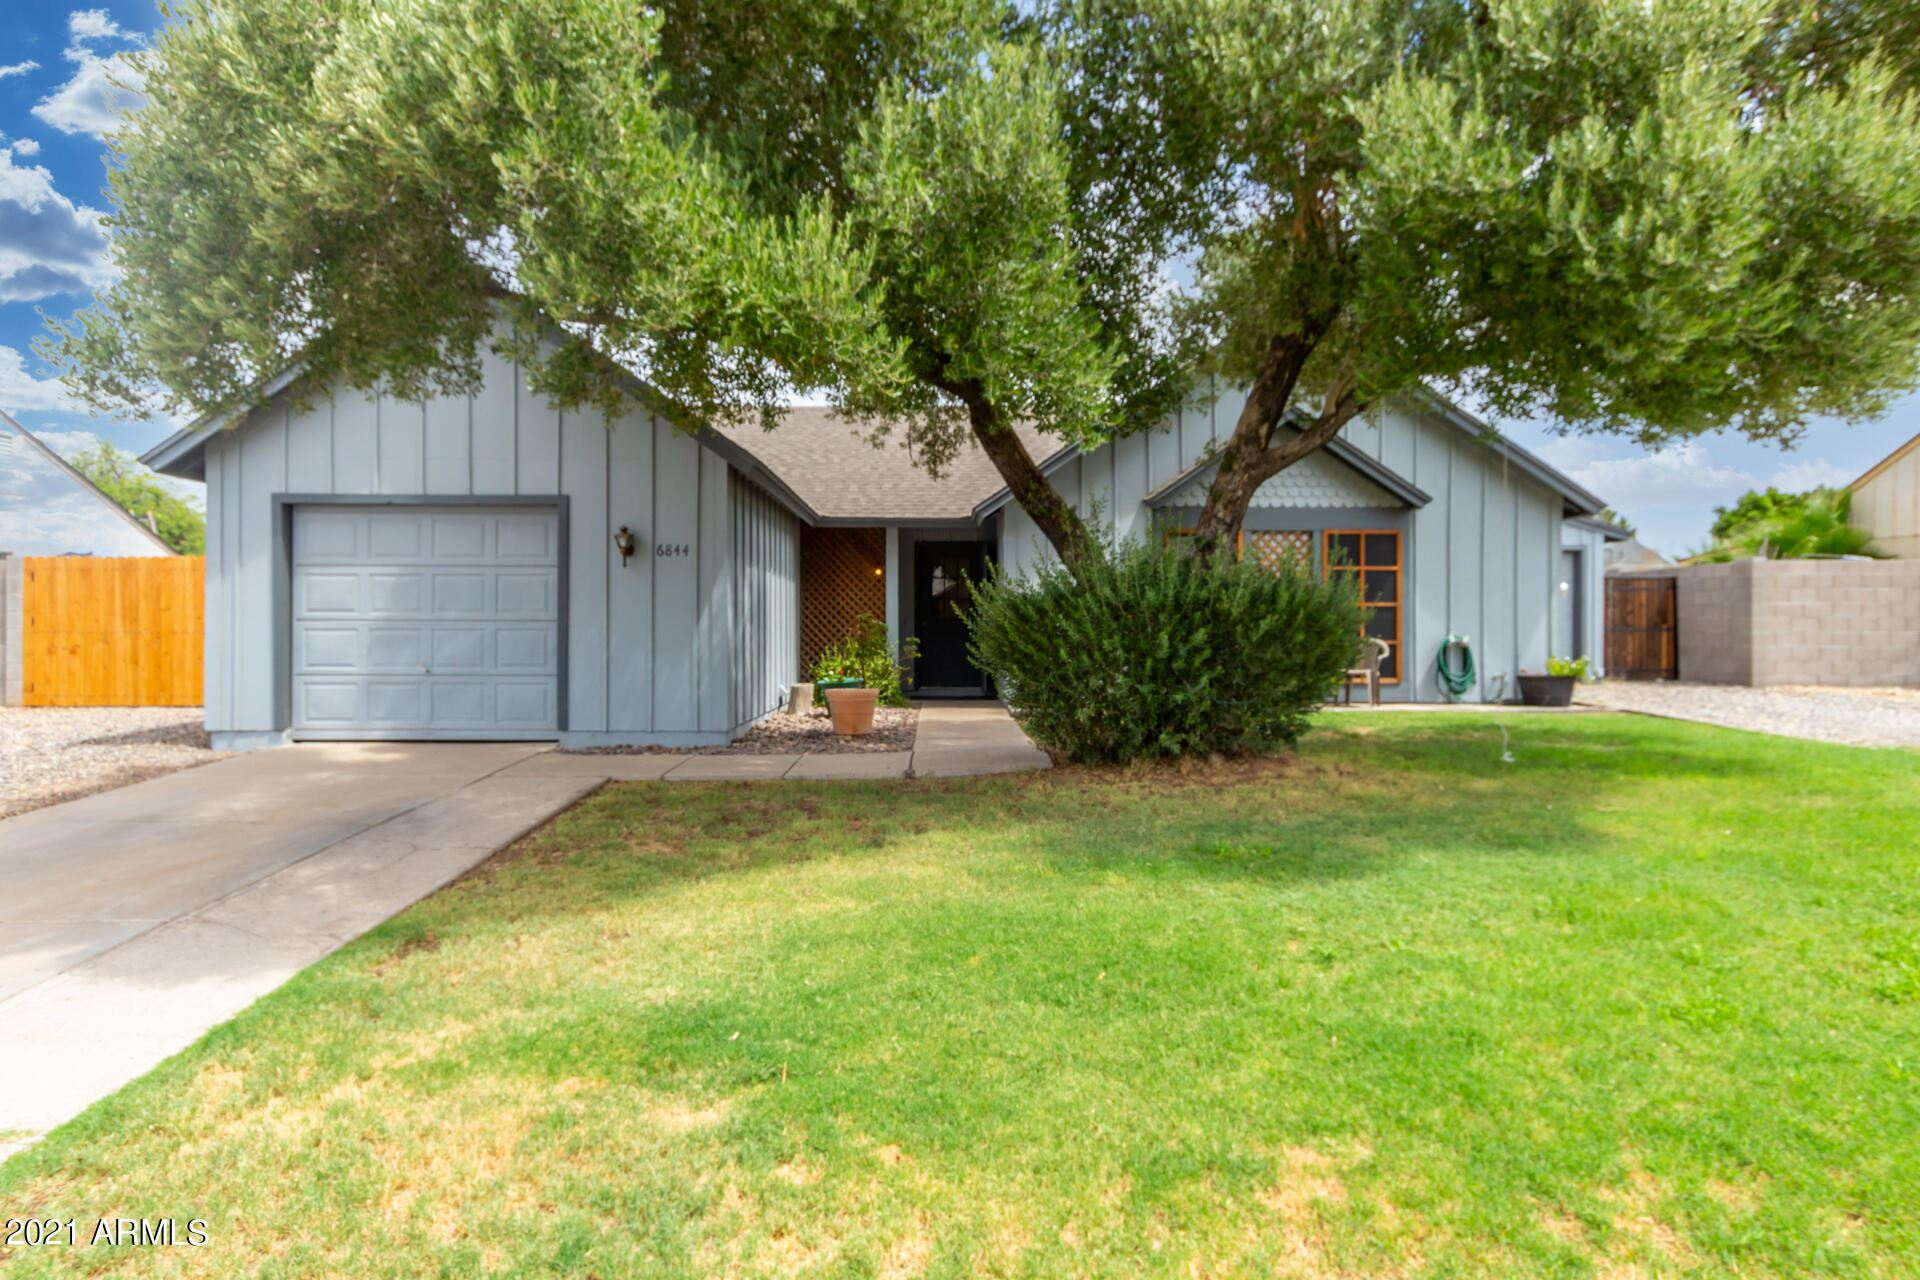 Photo of 6844 W Turquoise Avenue, Peoria, AZ 85345 (MLS # 6268311)